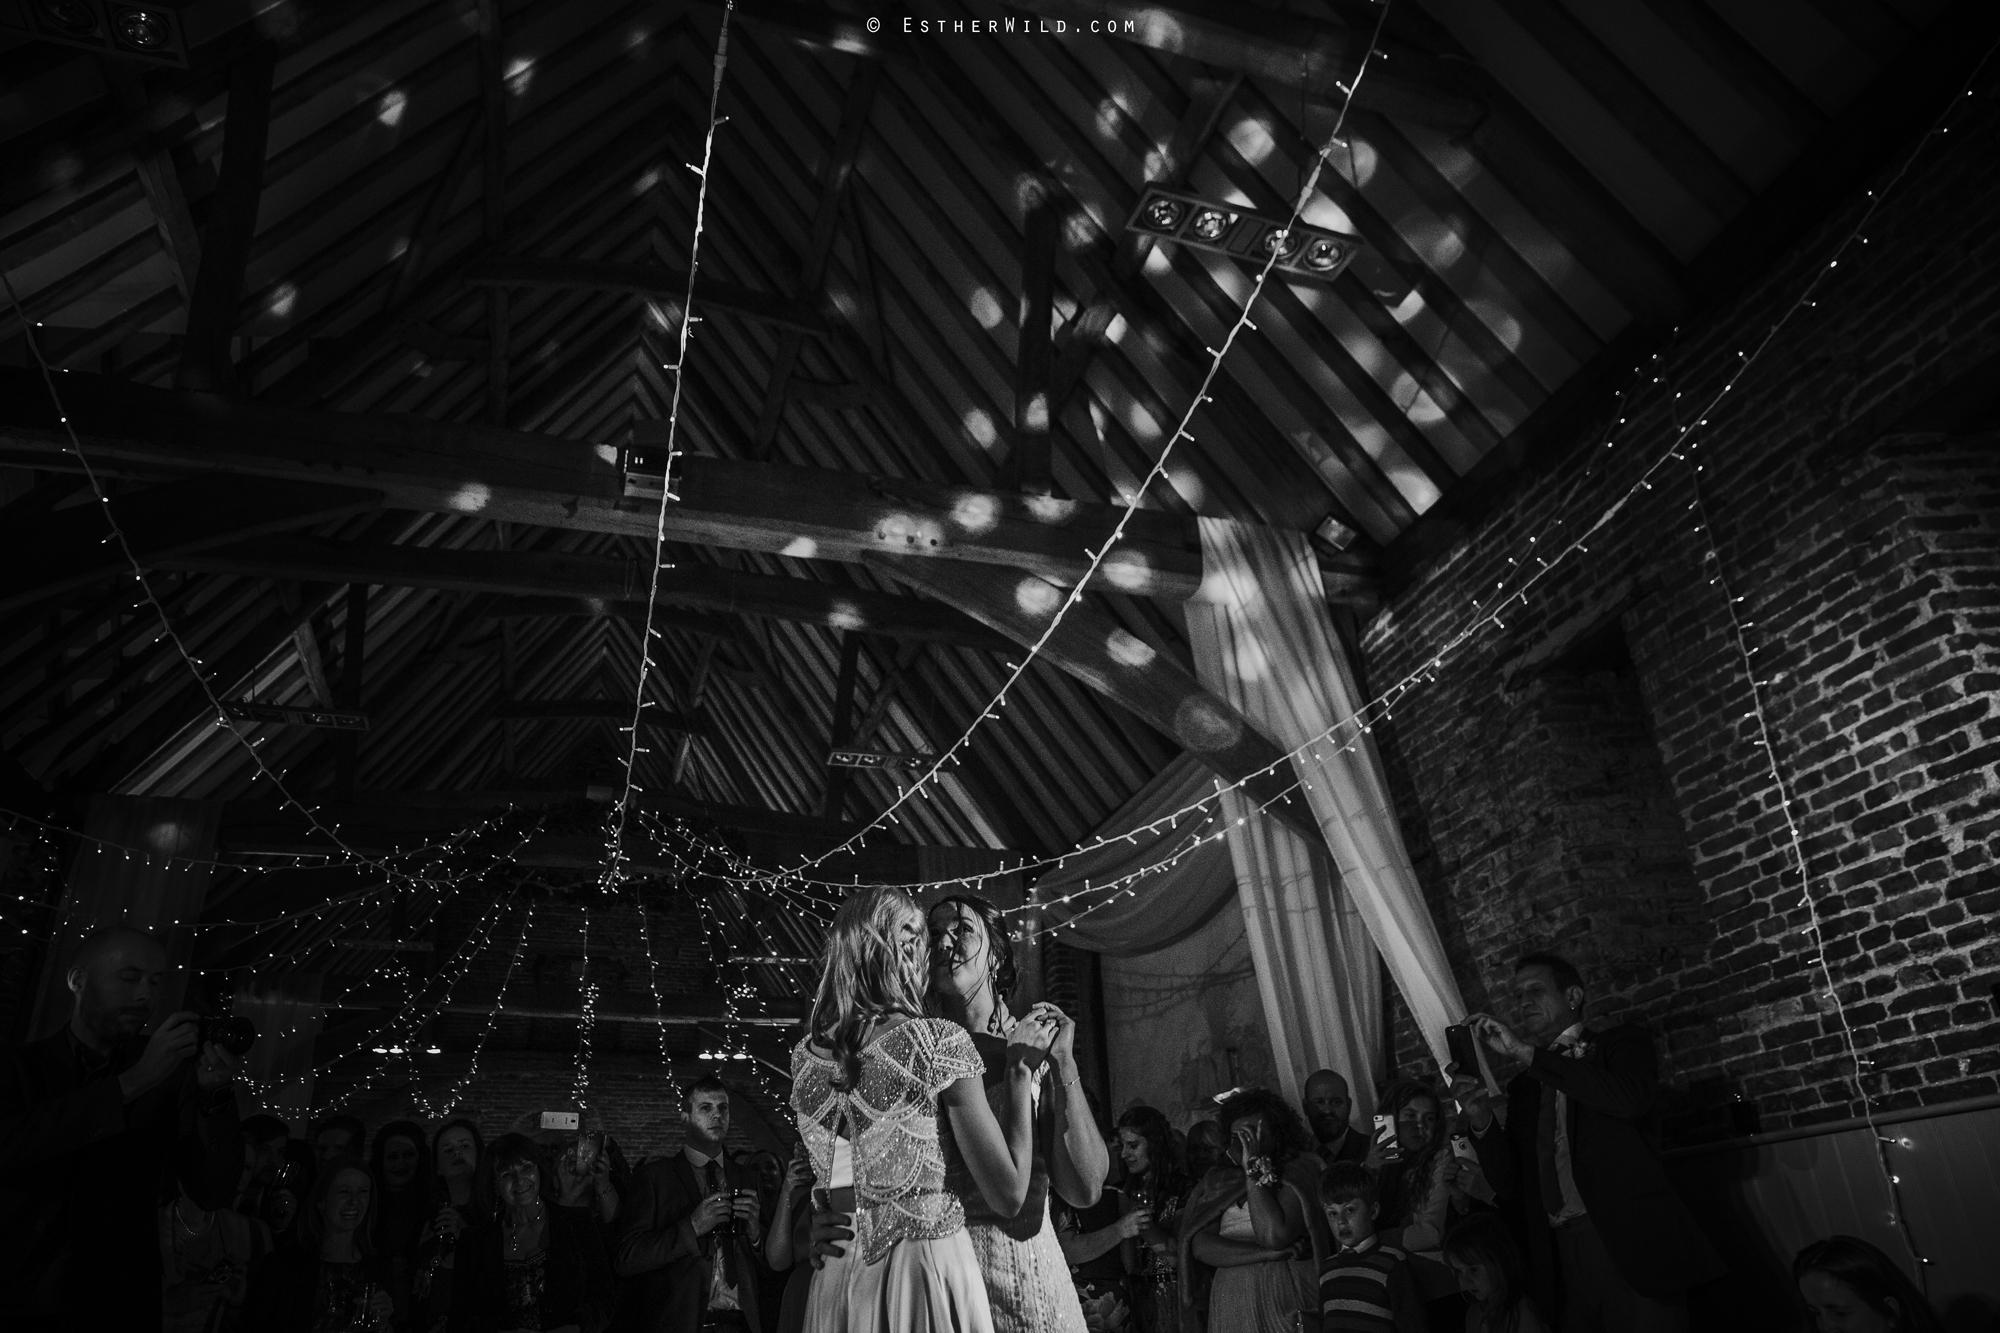 Elms_Barn_Weddings_Suffolk_Photographer_Copyright_Esther_Wild_IMG_3393-2.jpg